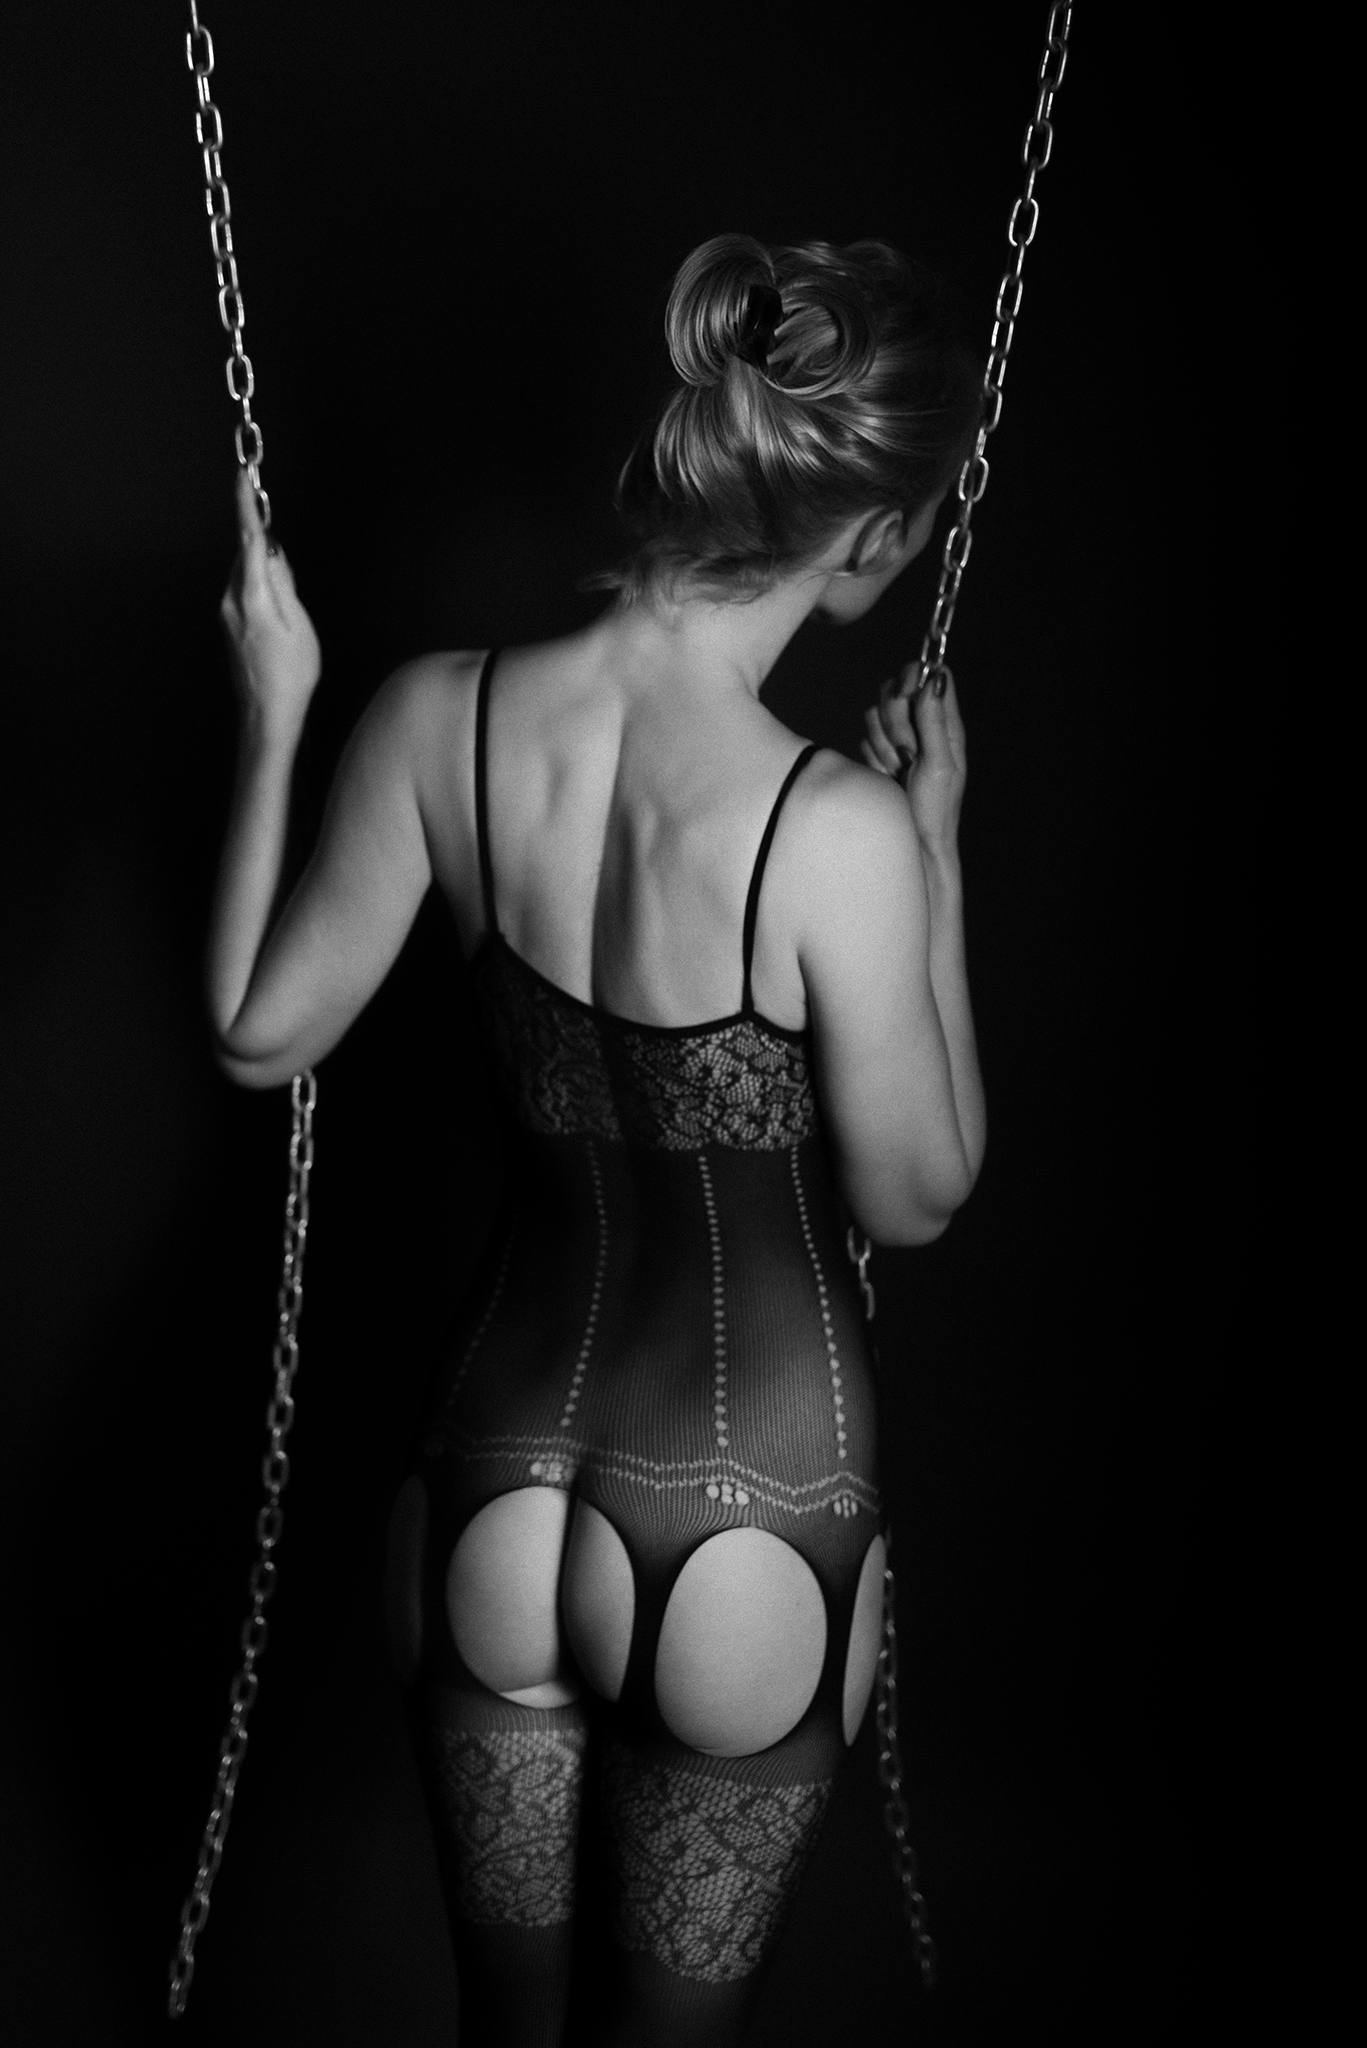 glamour photography photographer fine art lingerie